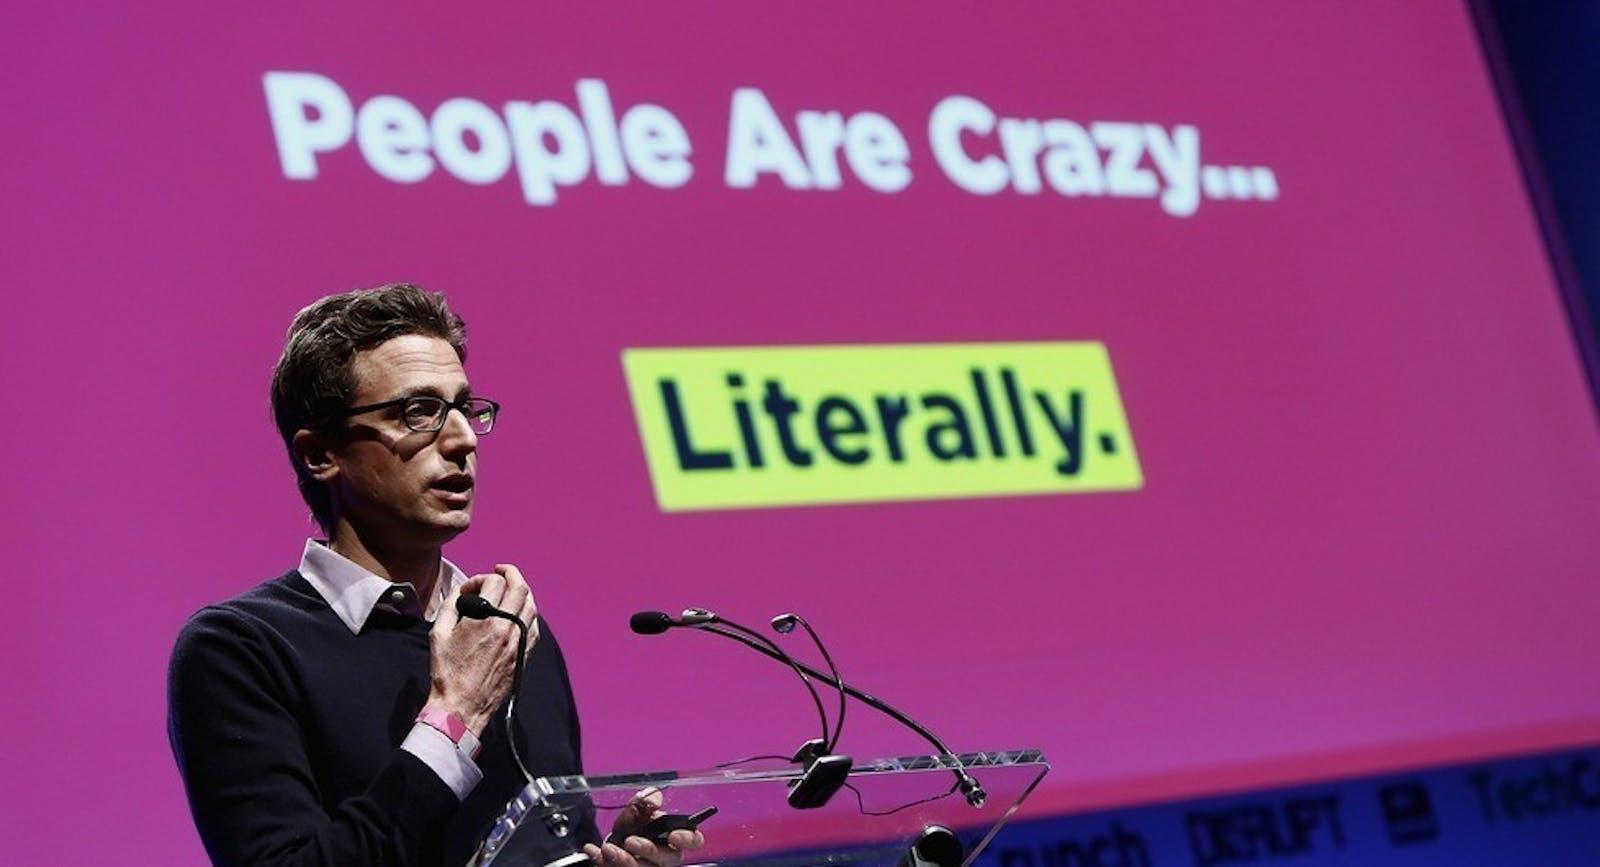 BuzzFeed CEO Jonah Peretti. Photo by TechCrunch.